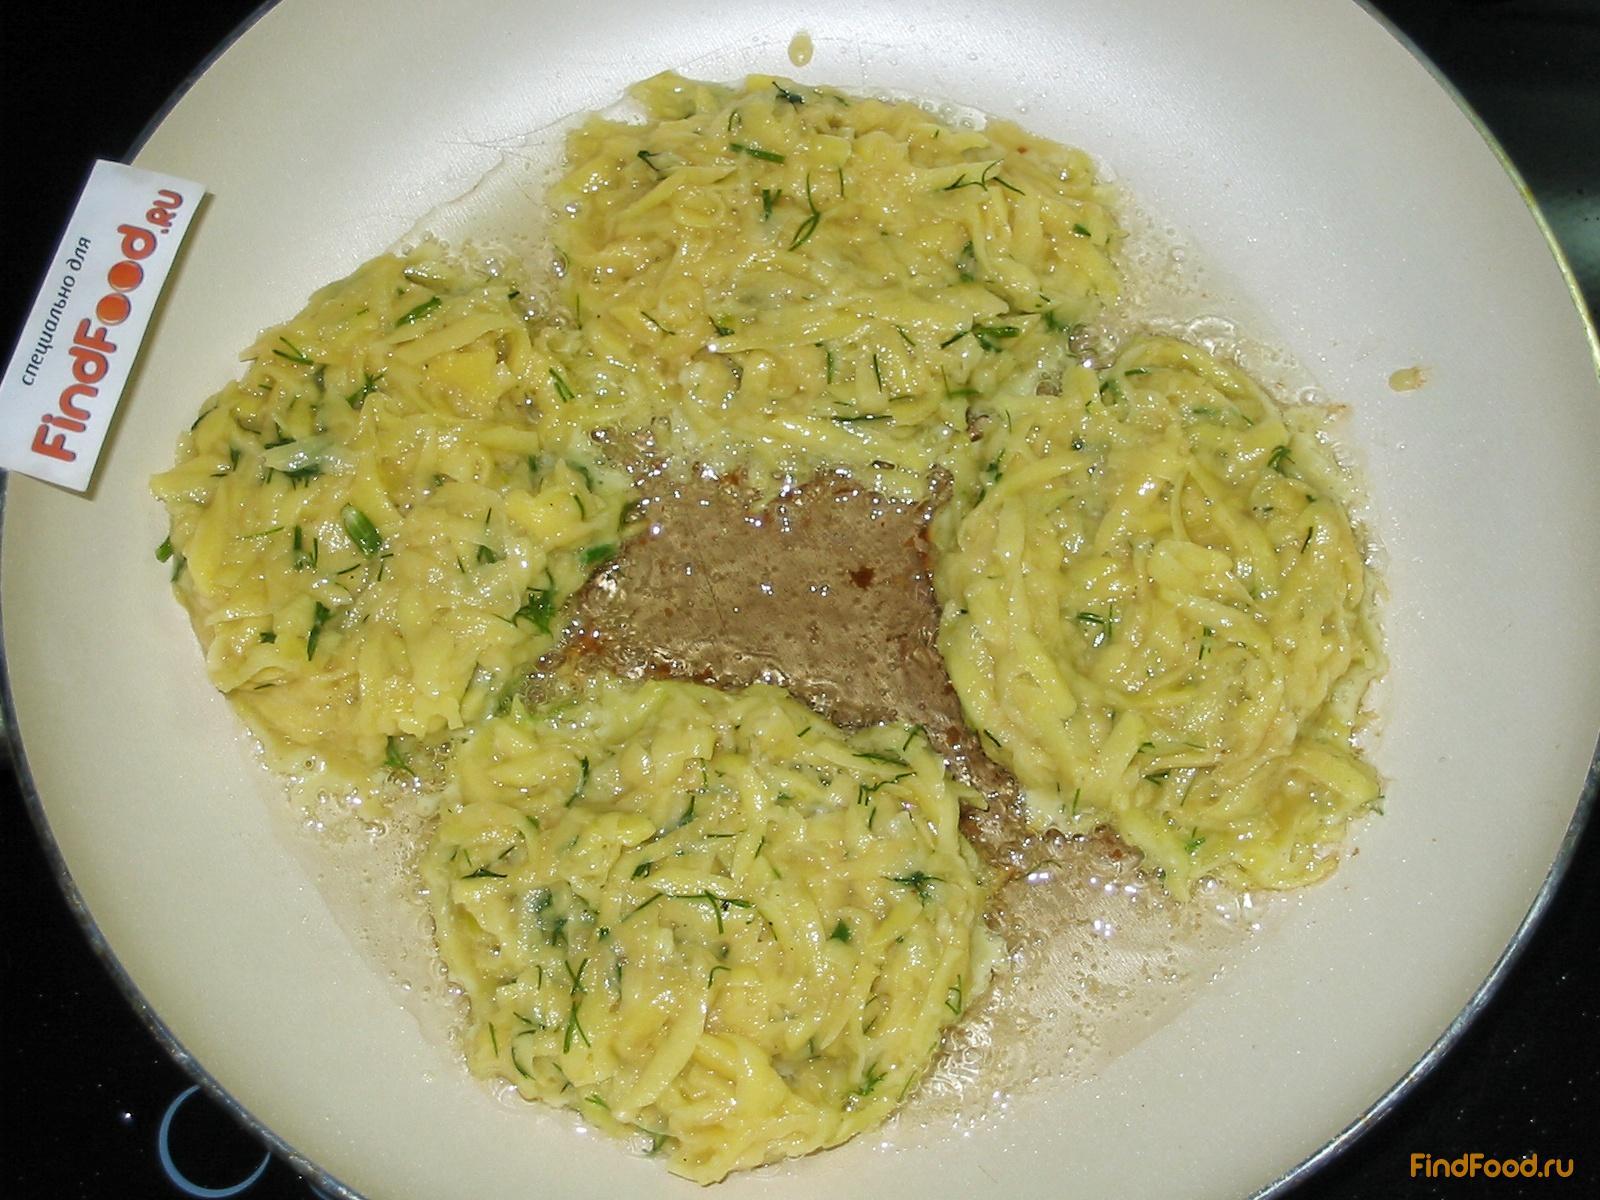 рецепт драников с луком и чесноком